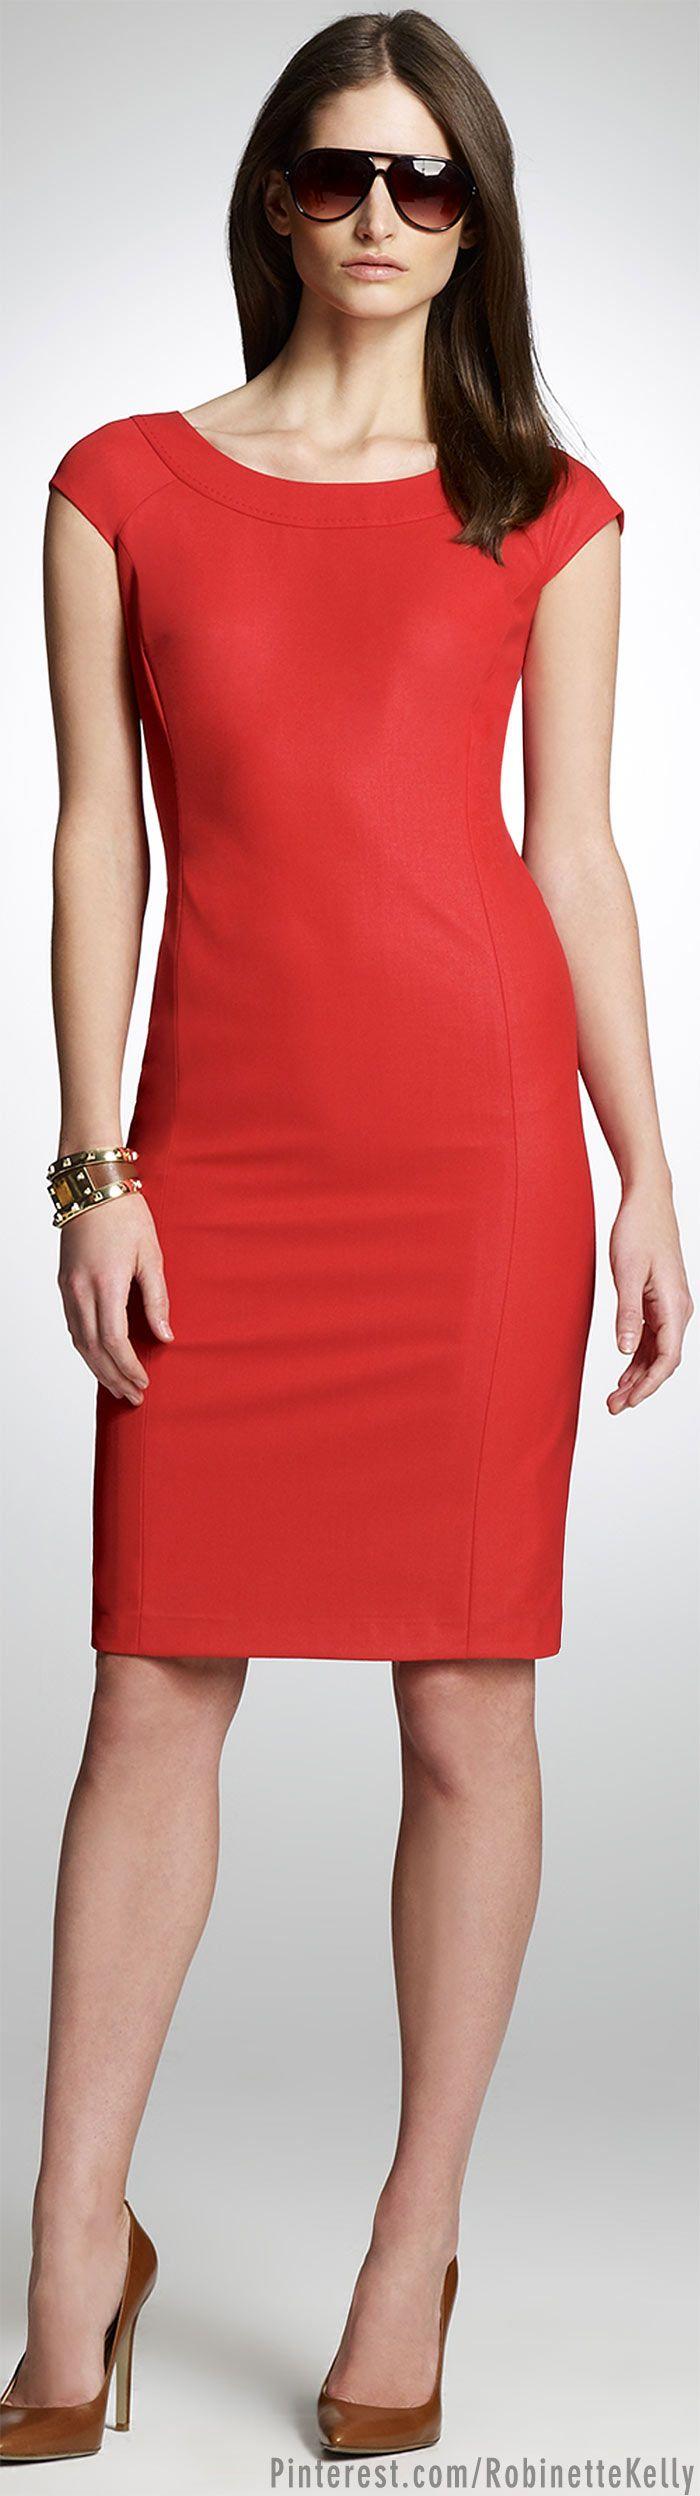 Jones New York | Poppy Red Sheath Dress  OMgosh I LOVE this!